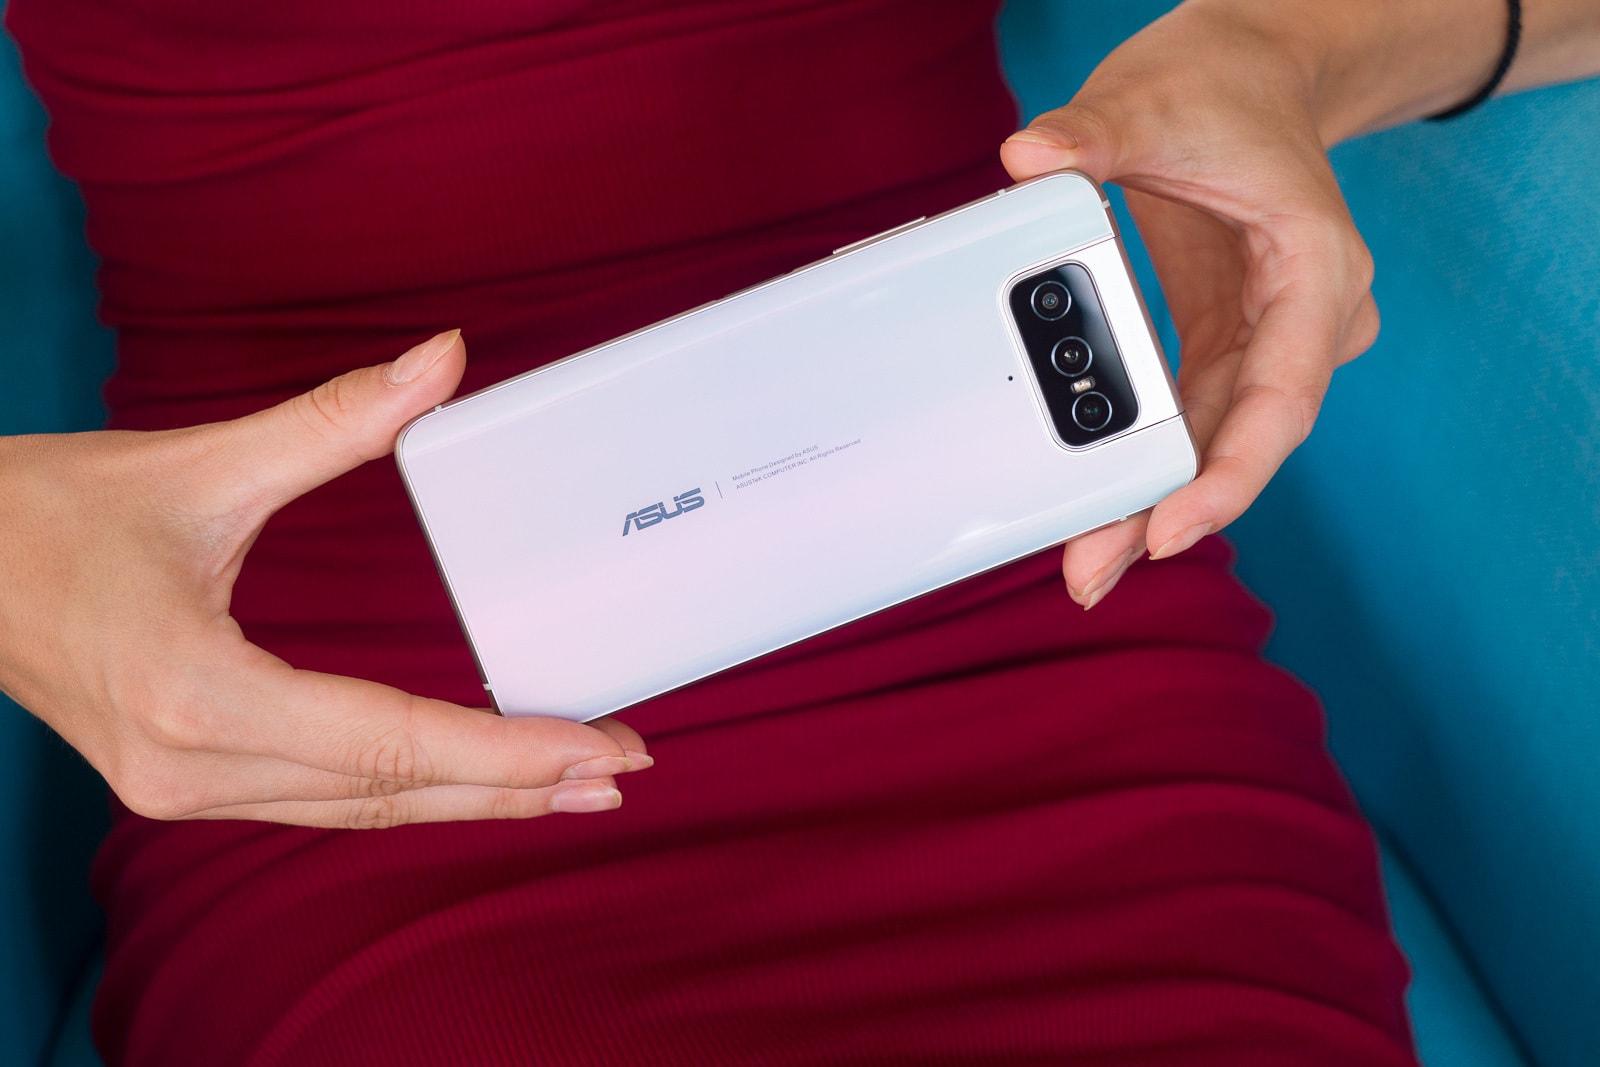 Преглед на смартфони Asus Zenfone 7 ZS670KS и Asus Zenfone 7 Pro ZS671KS